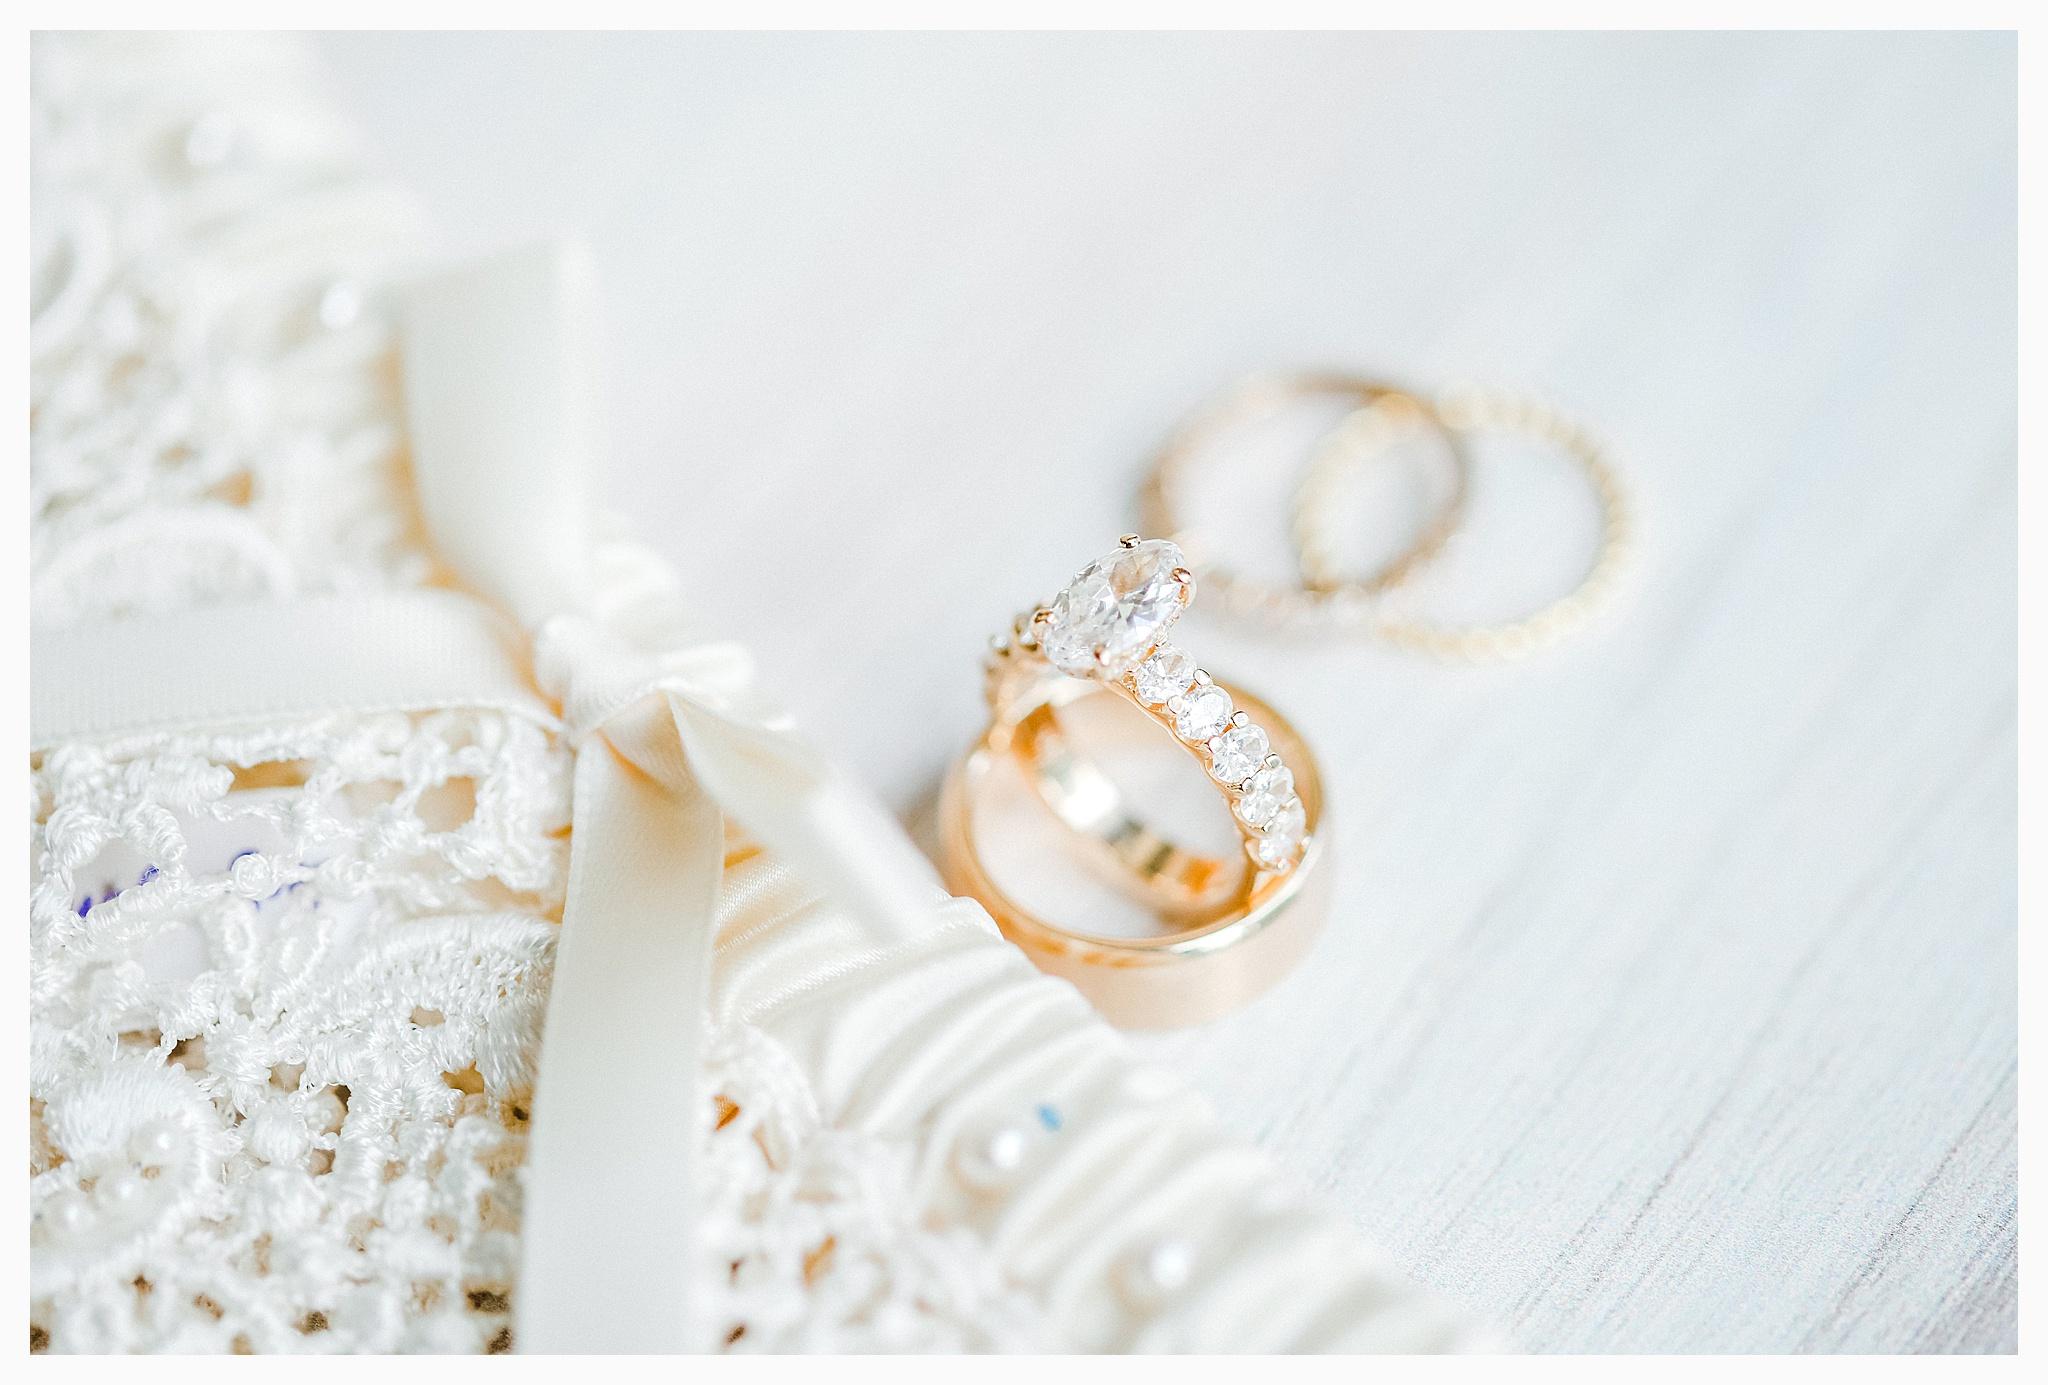 Emma Rose Company Light and Airy Wedding Photographer, Beautiful fall wedding at Rock Creek Gardens Venue in Puyallup, Washington._0007.jpg